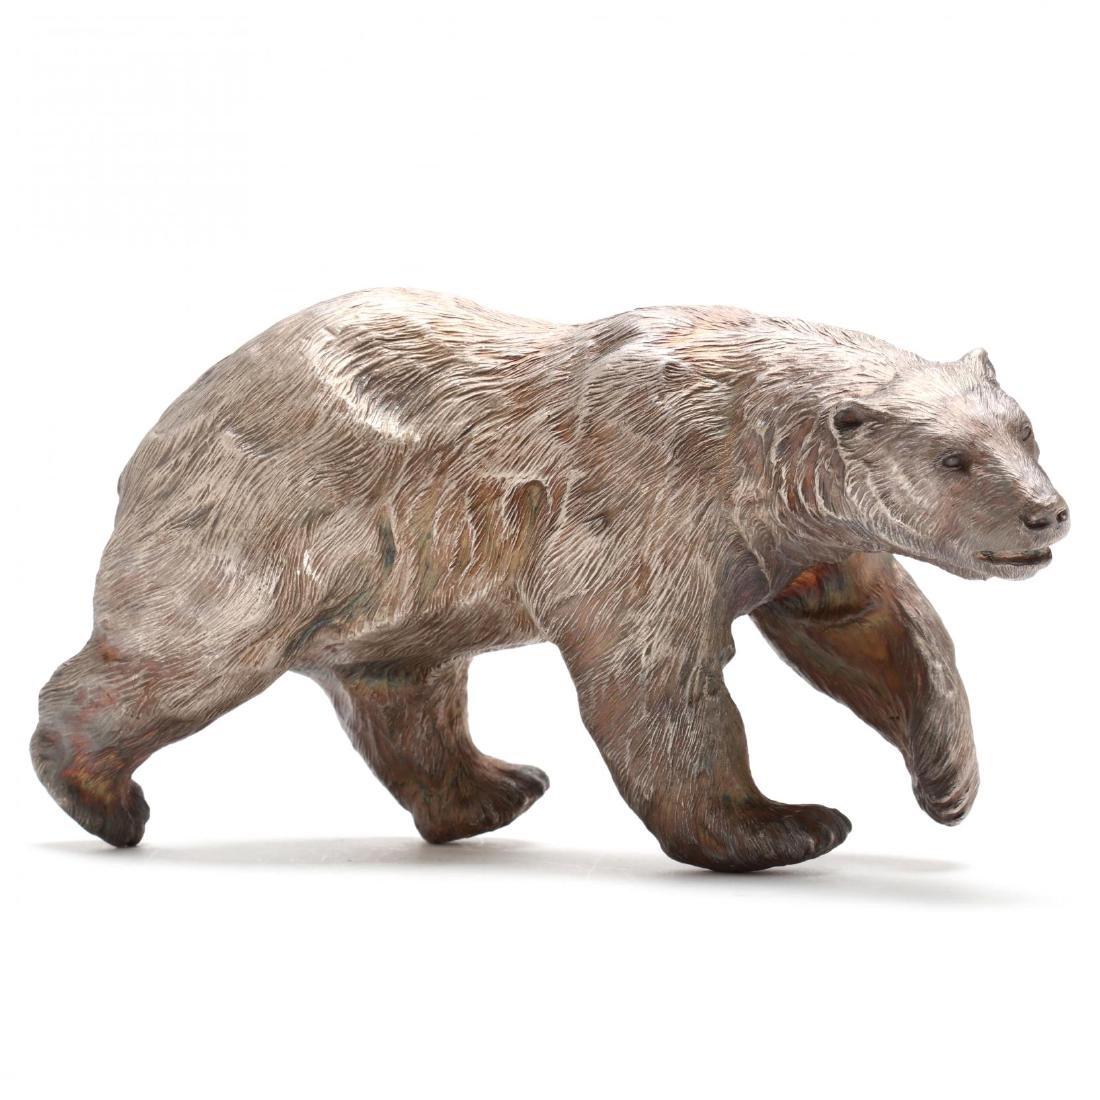 Douglas Van Howd (CA/NV, b. 1935), Standing Polar Bear